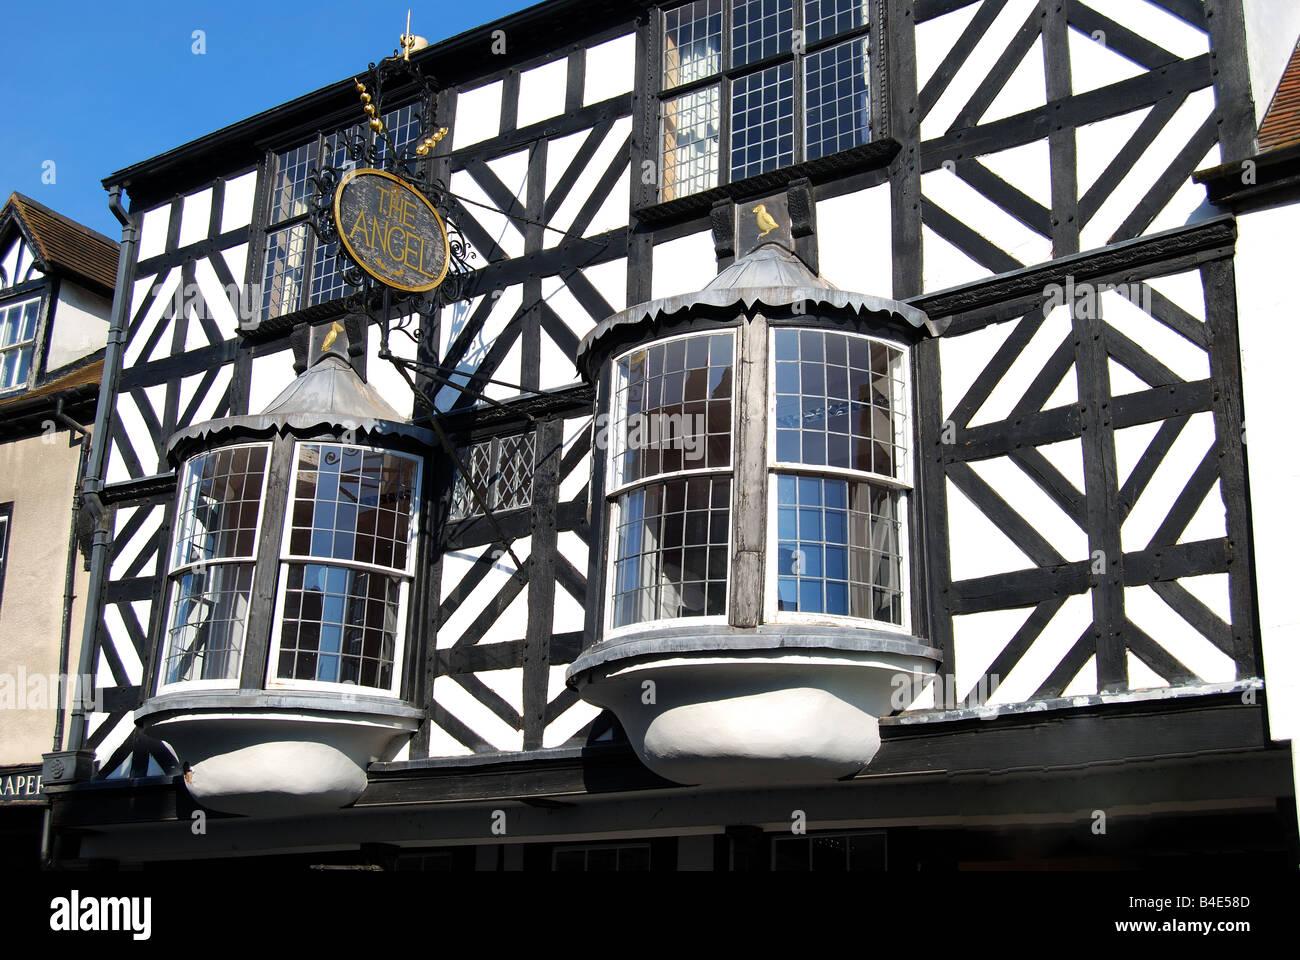 The Angel, Tudor House frontage, Broad Street, Ludlow, Shropshire, England, United Kingdom - Stock Image